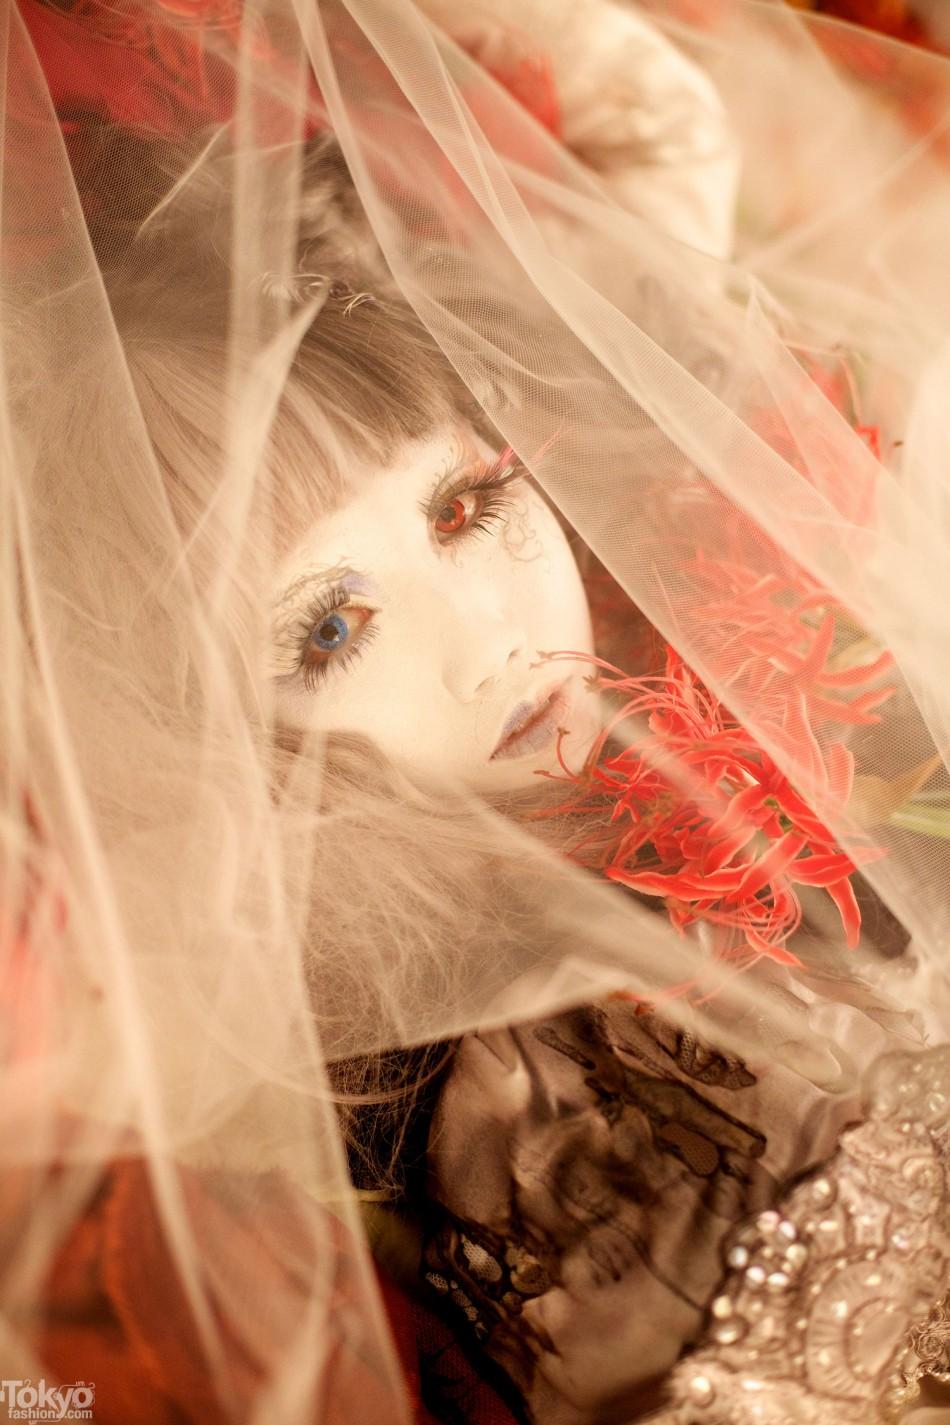 Minori - Her Memories of a Dream (12)